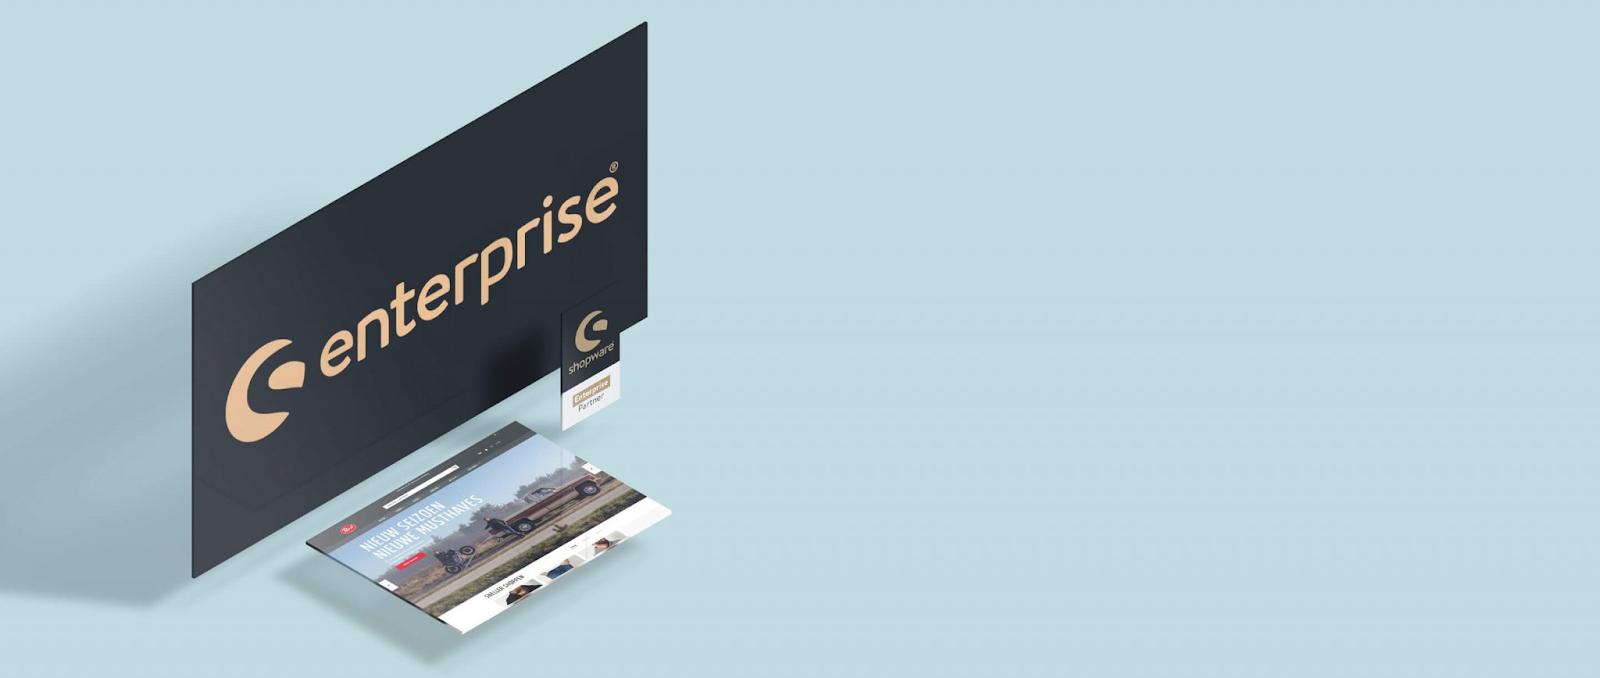 Shopware Enterprise Development Process